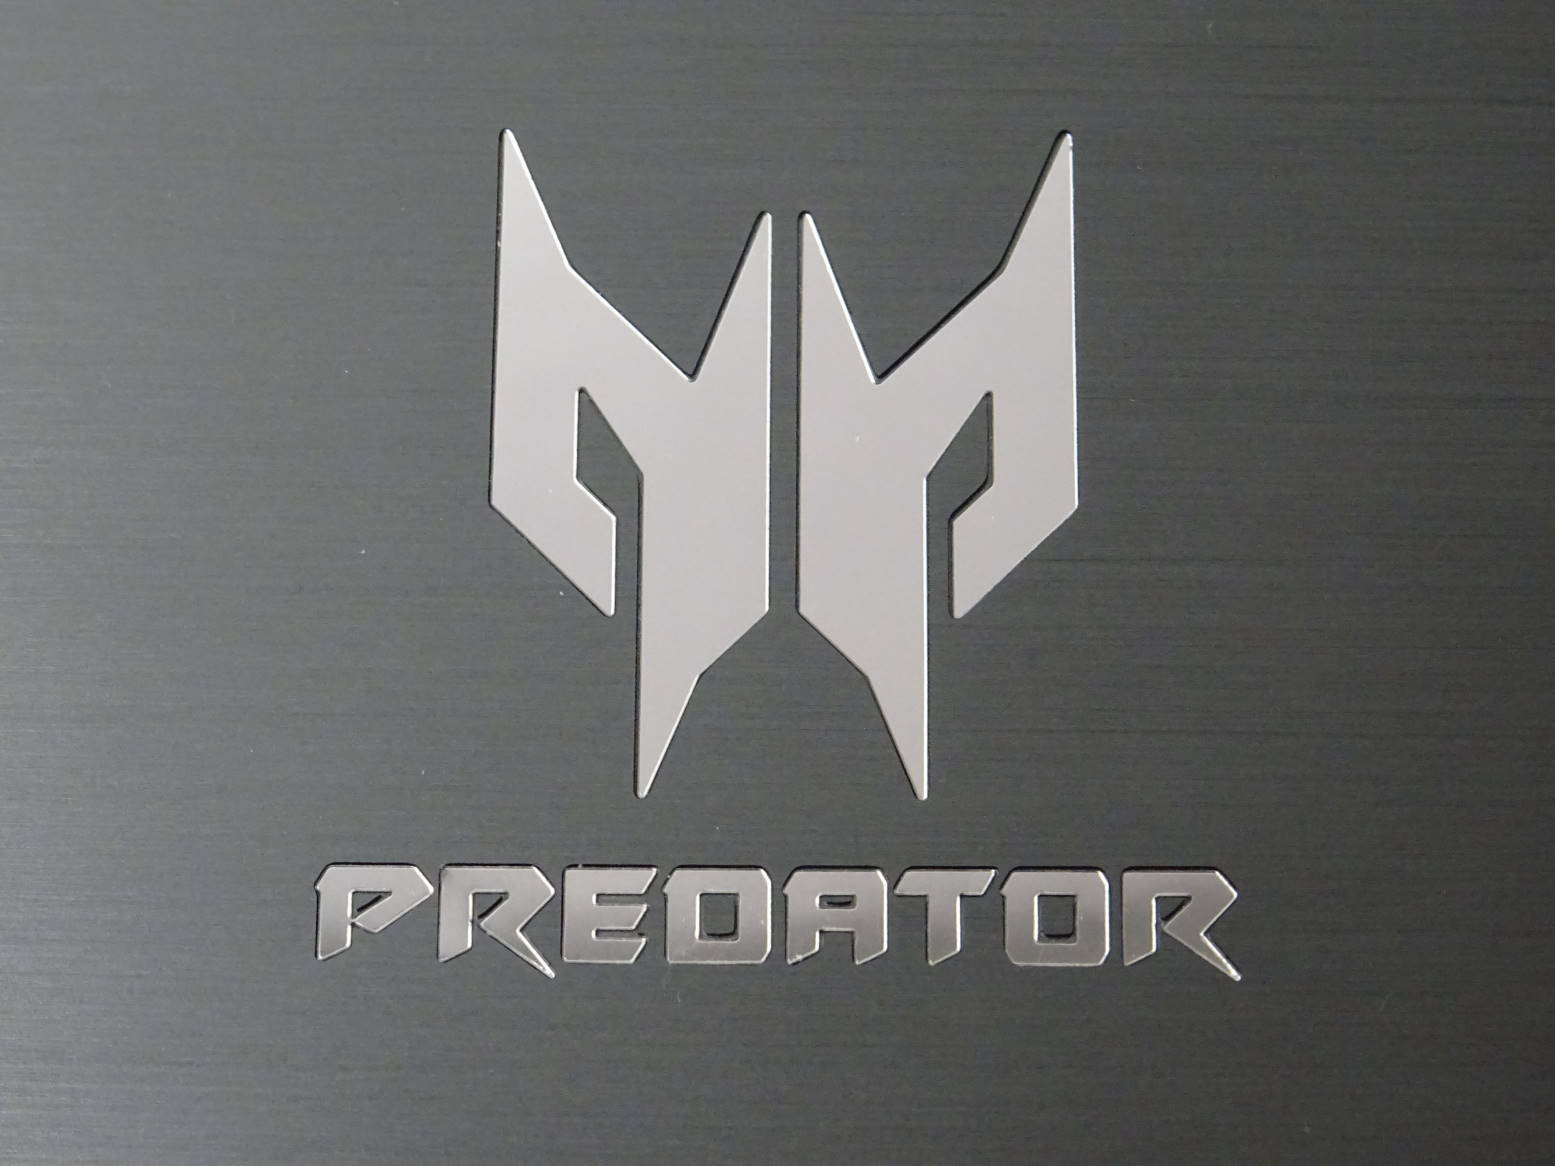 Predator 8 GT-810 専用保護シートは高光沢・低反射・キズ修復・ブルーライトカットの4タイプ!(OverLay)